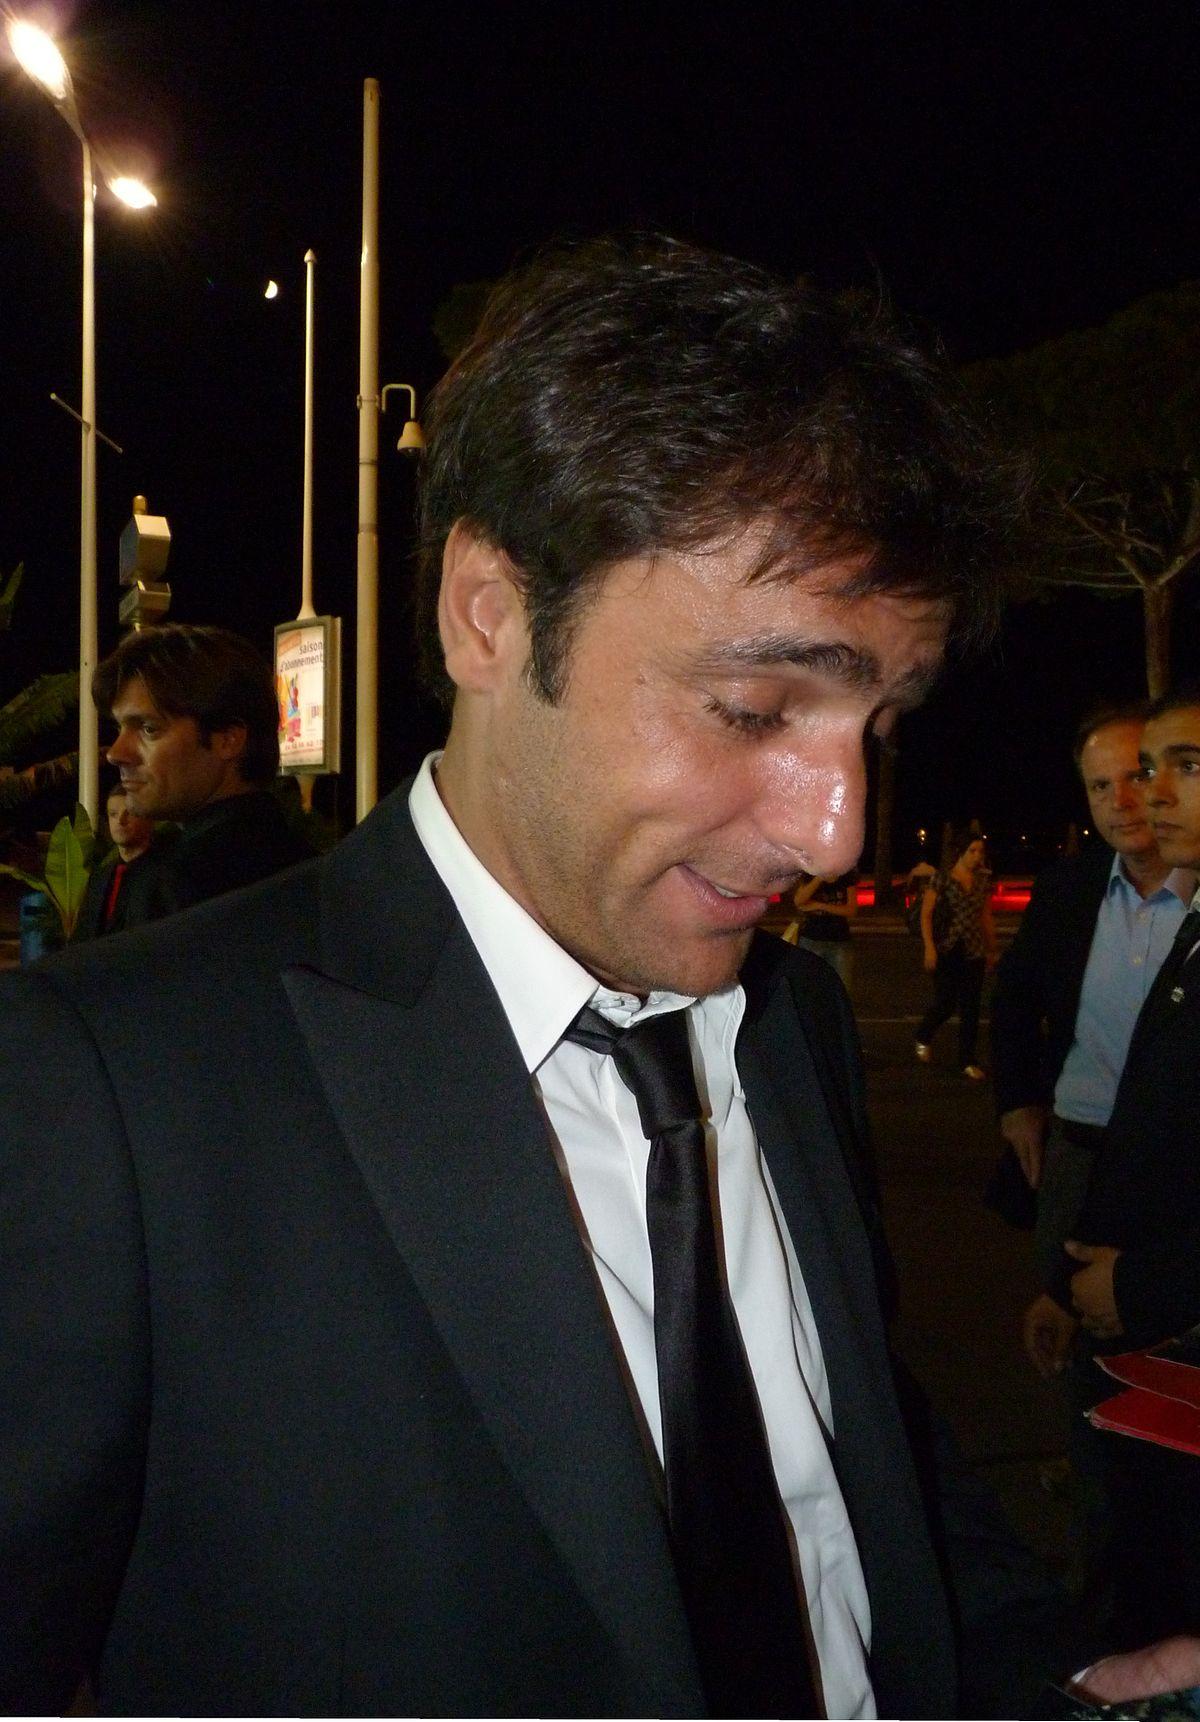 Adriano Giannini - Wik...